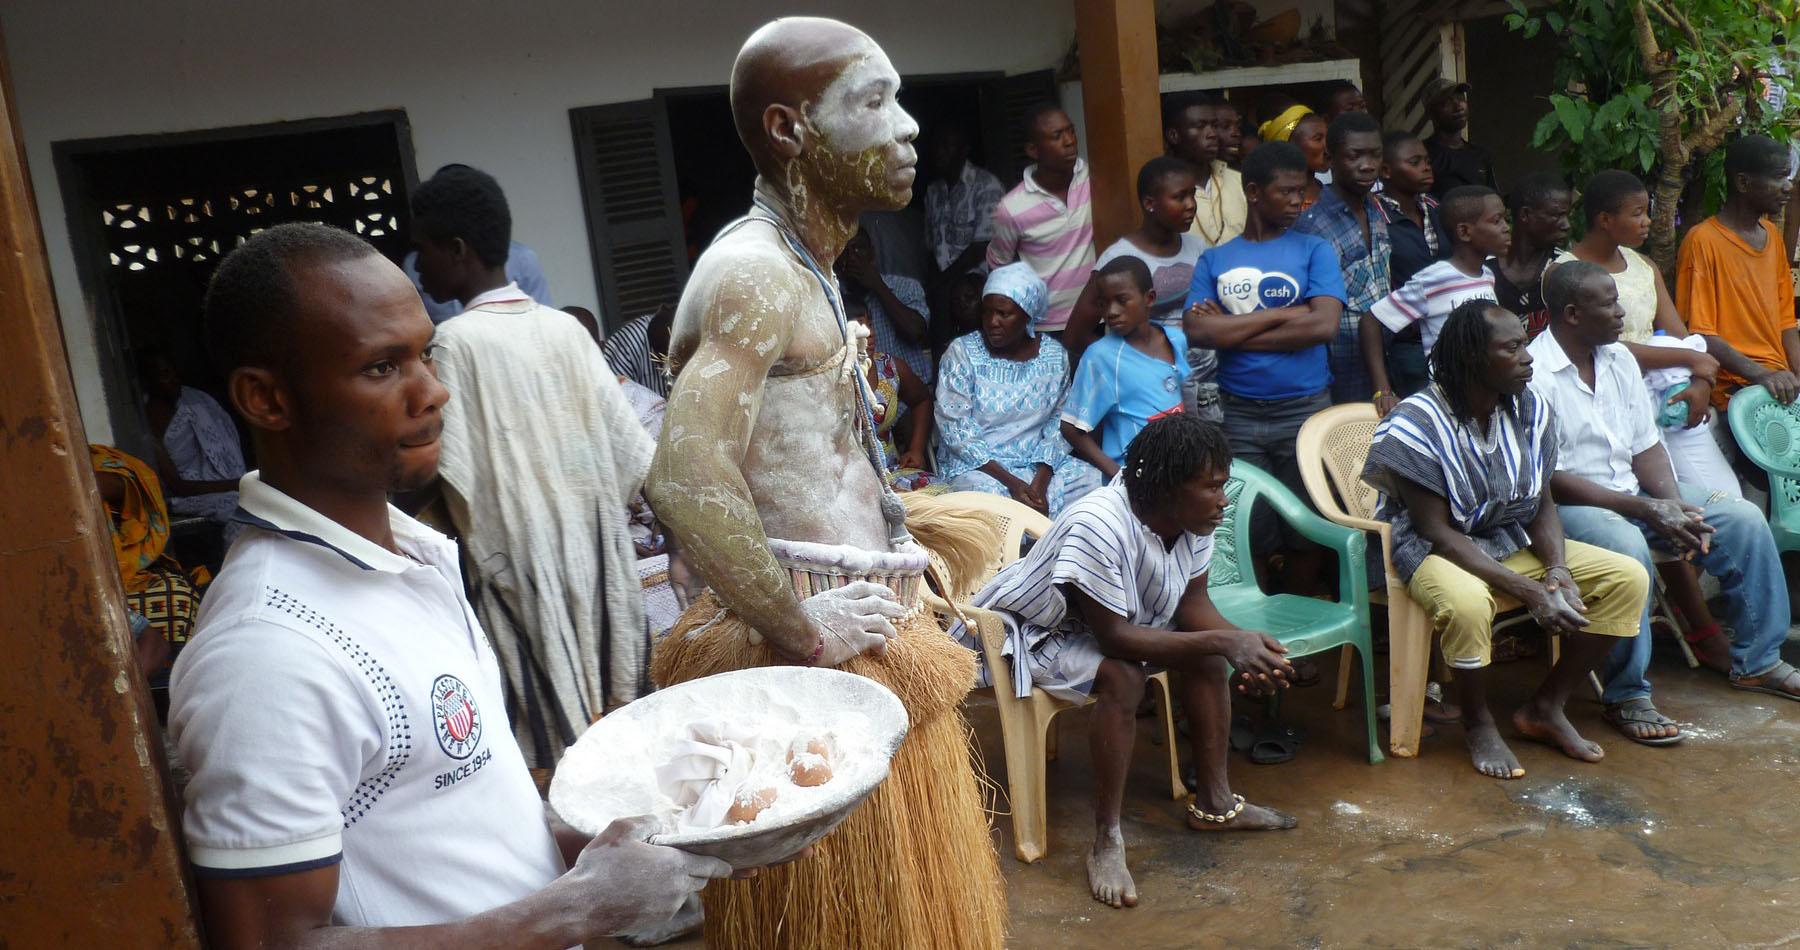 Nana Kwabena Bena at akom